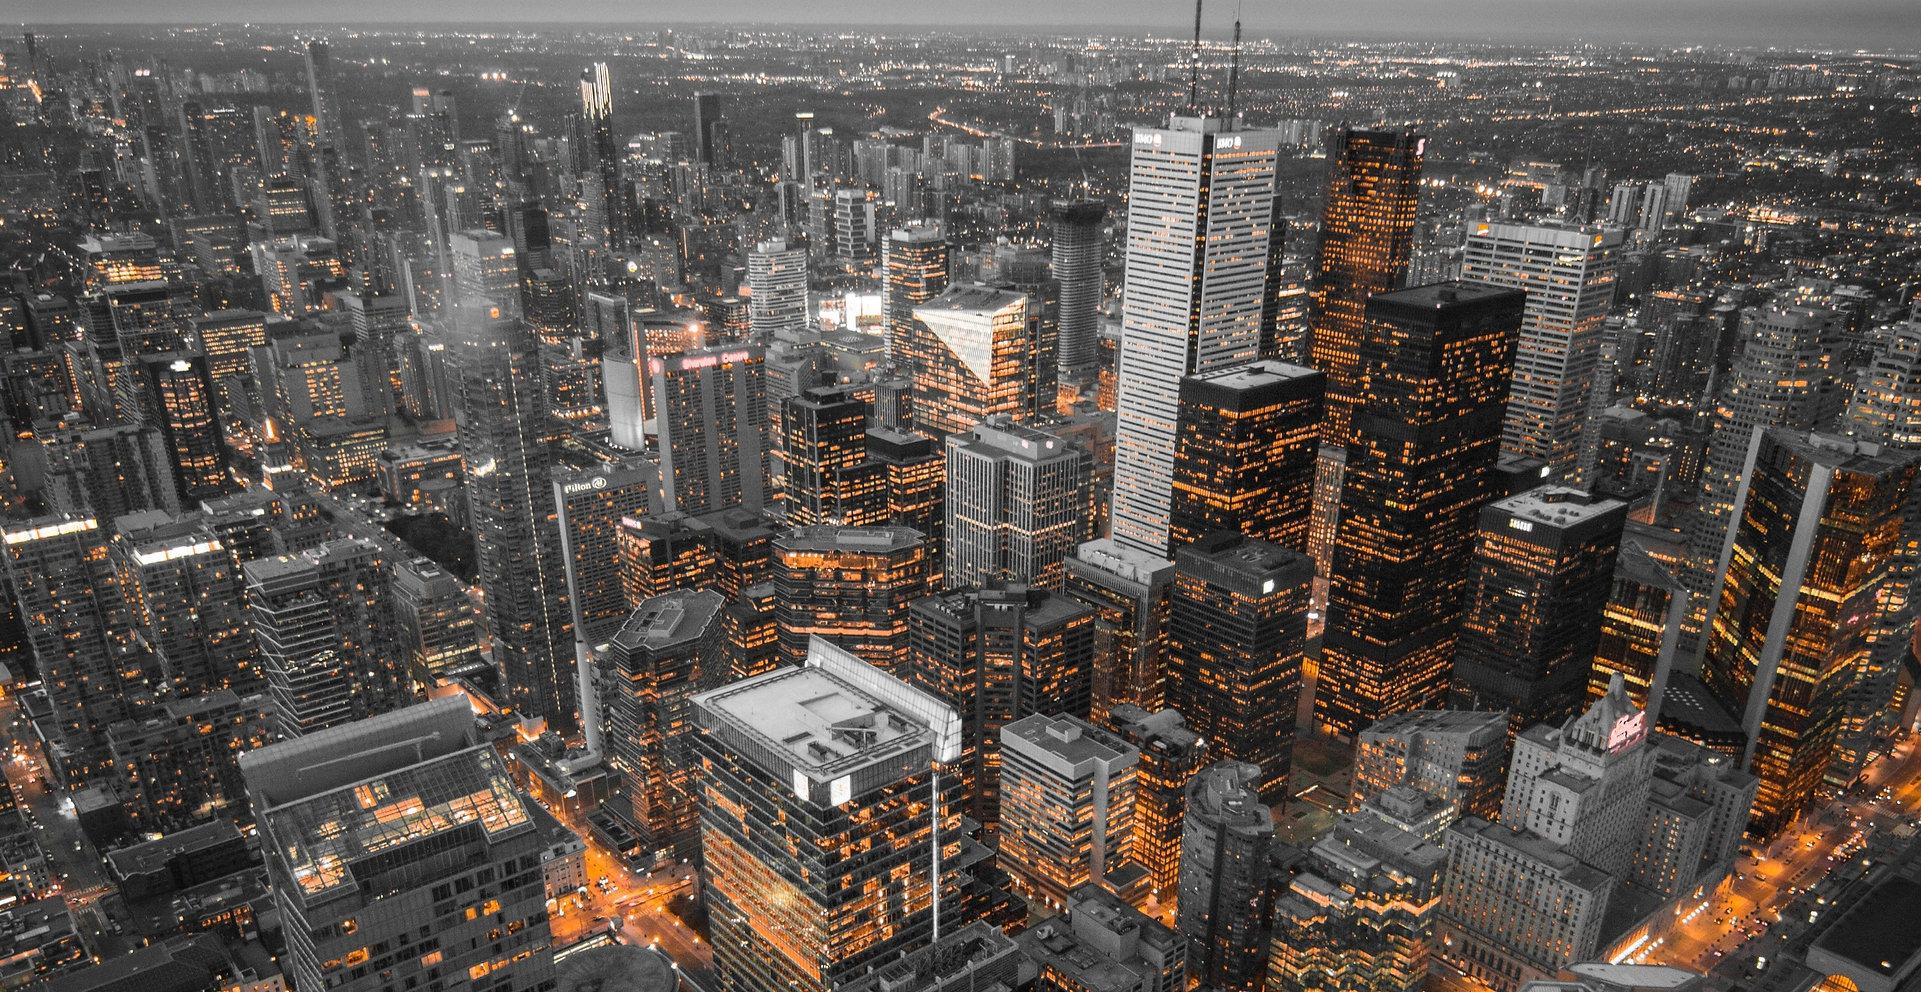 skyscrapers_top_view_metropolis_124217_3